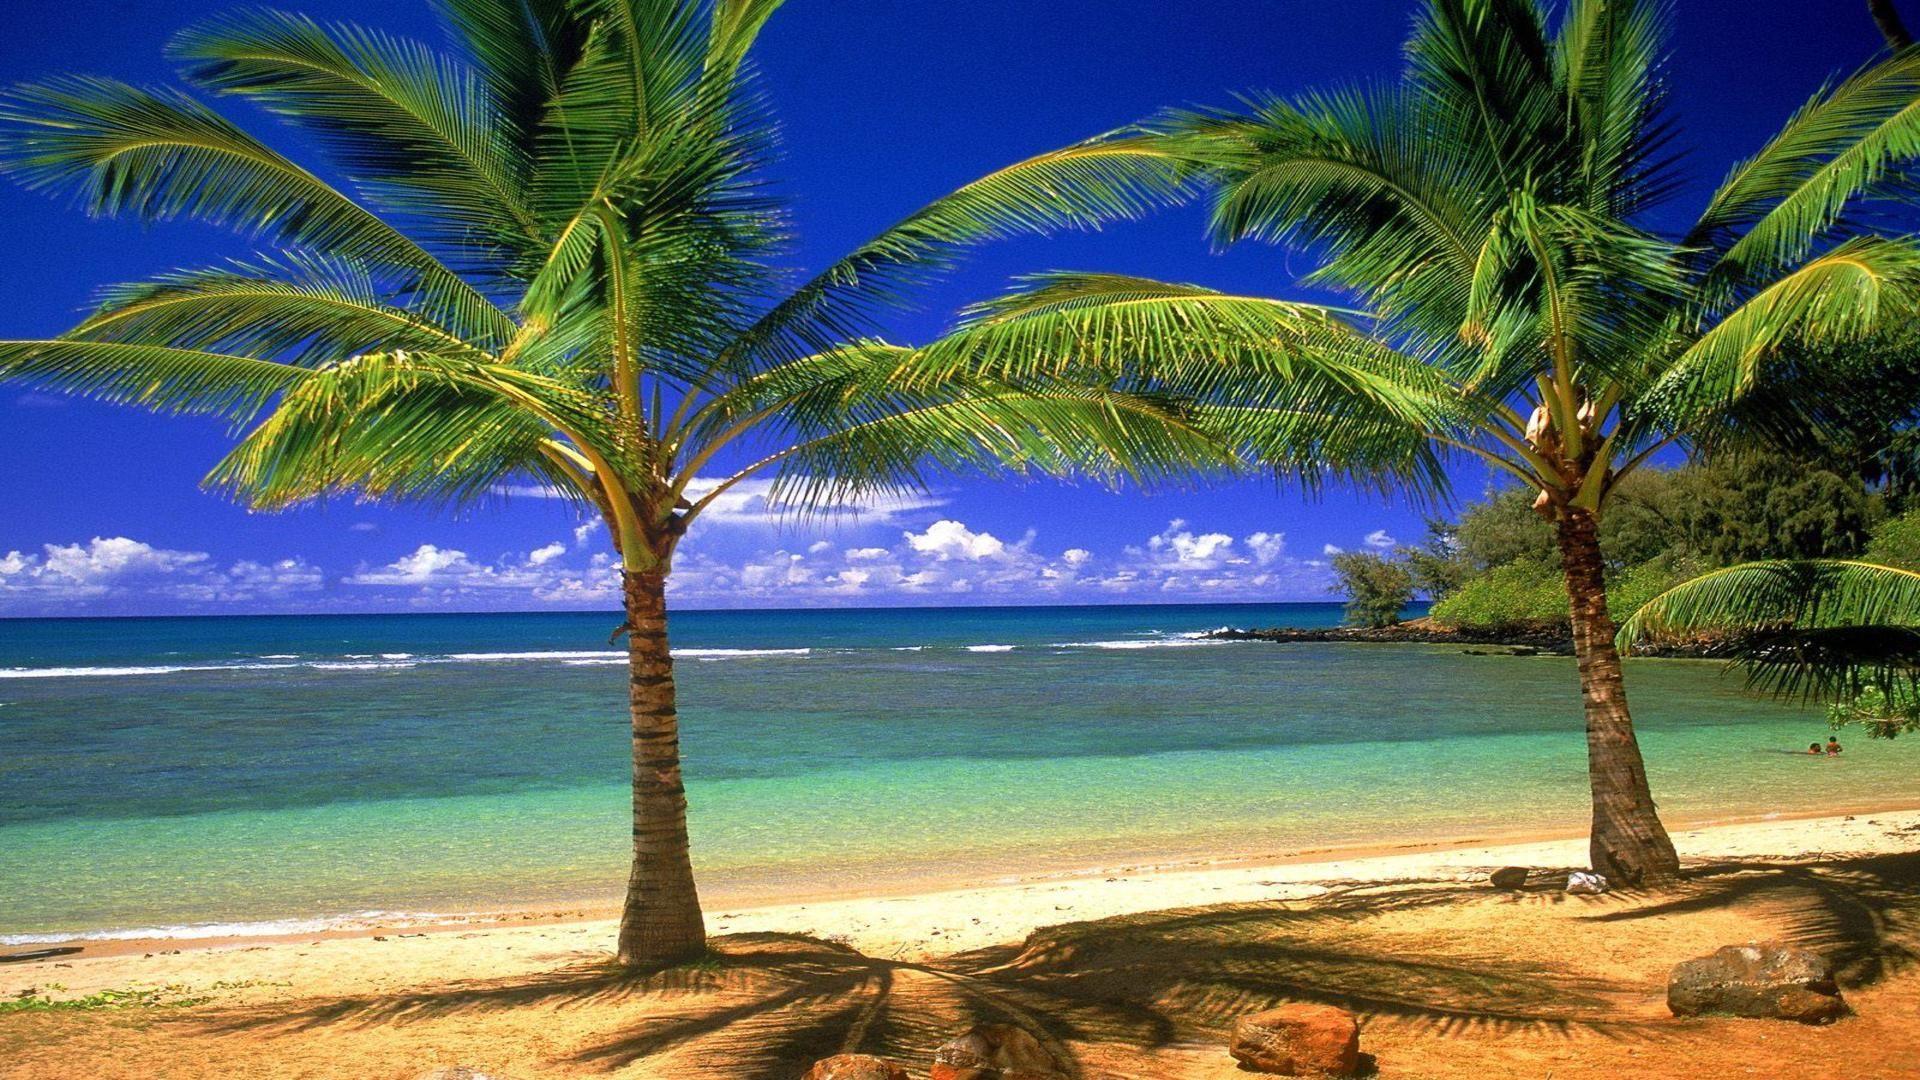 Palm tree beach wallpapers wallpaper cave - Free palm tree screensavers ...